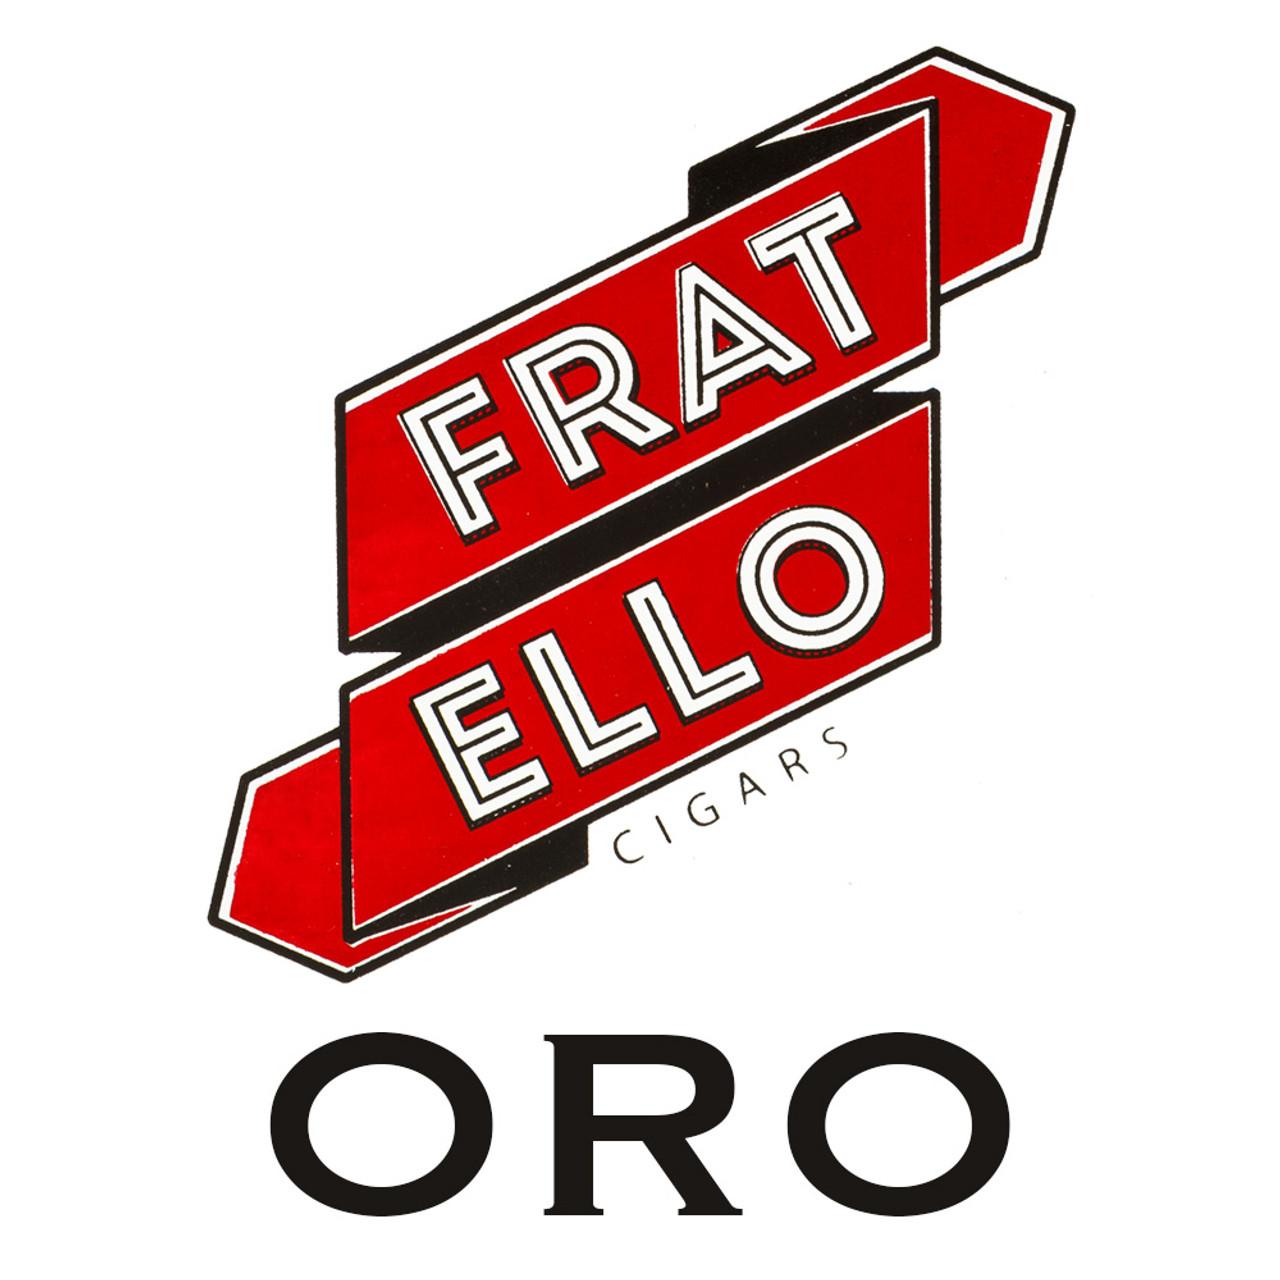 Fratello Oro Gordo Cigars - 6 x 60 (Box of 20)